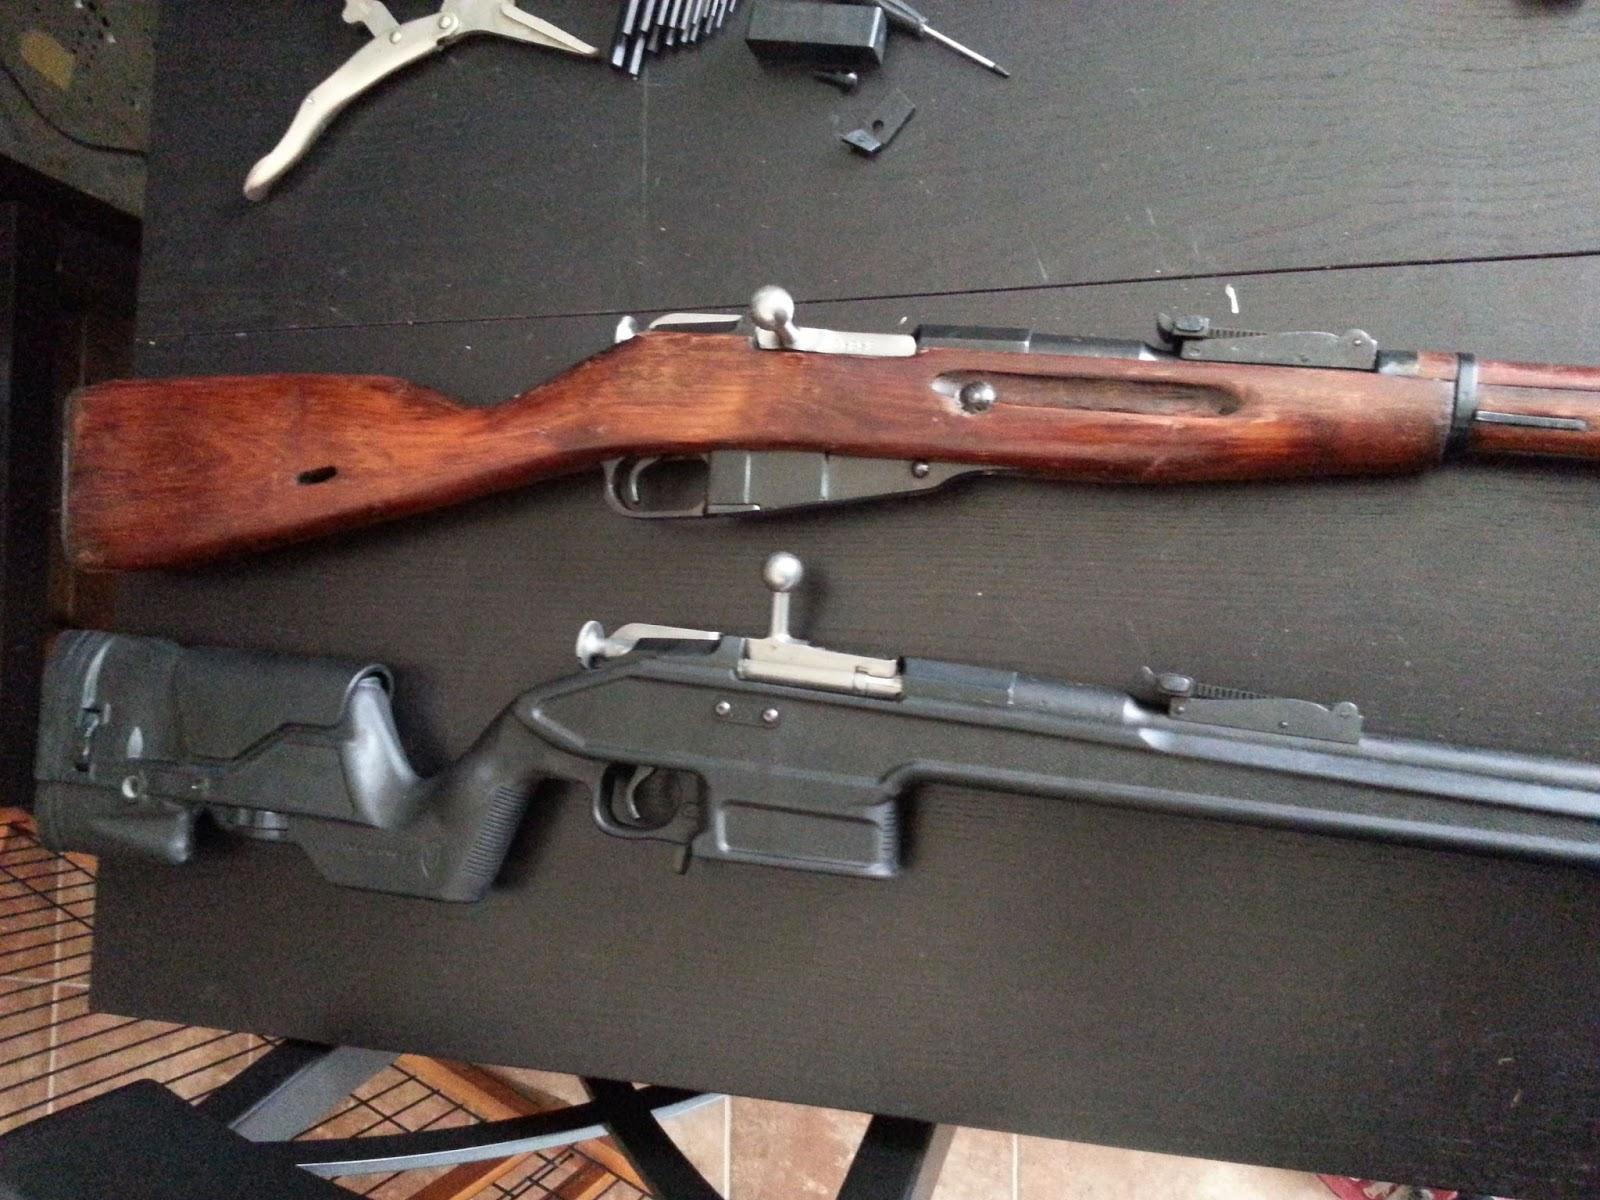 AA9130 Archangel Rifle Stocks & Accessories - mosin nagant archangel stock